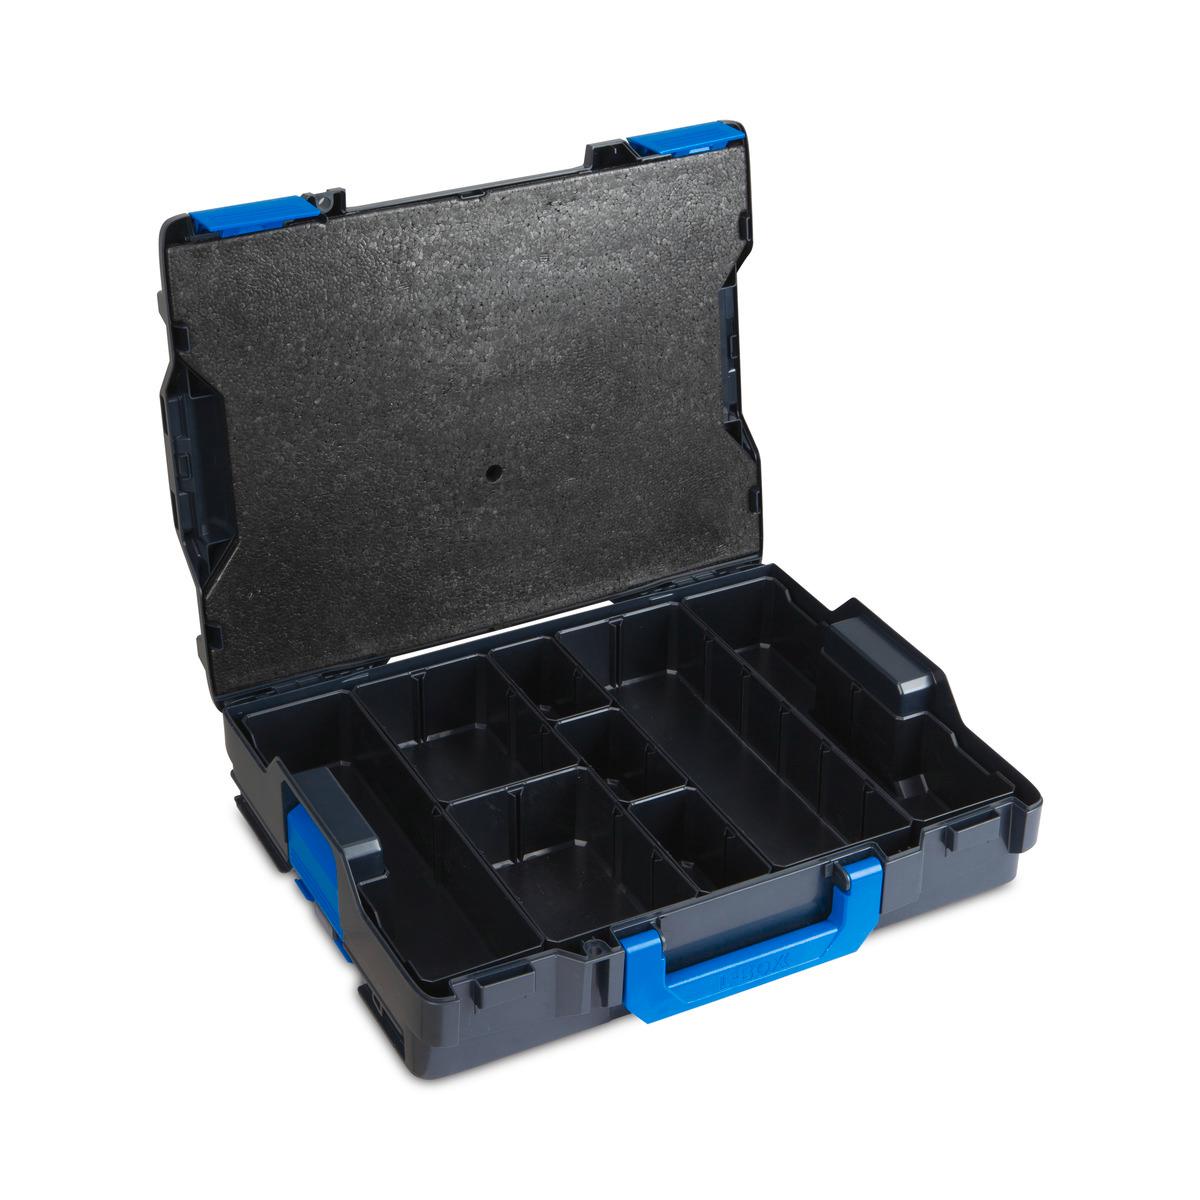 L Boxx 102 G4 Inkl 8 Insetboxen H63 Sortimo Online Shop